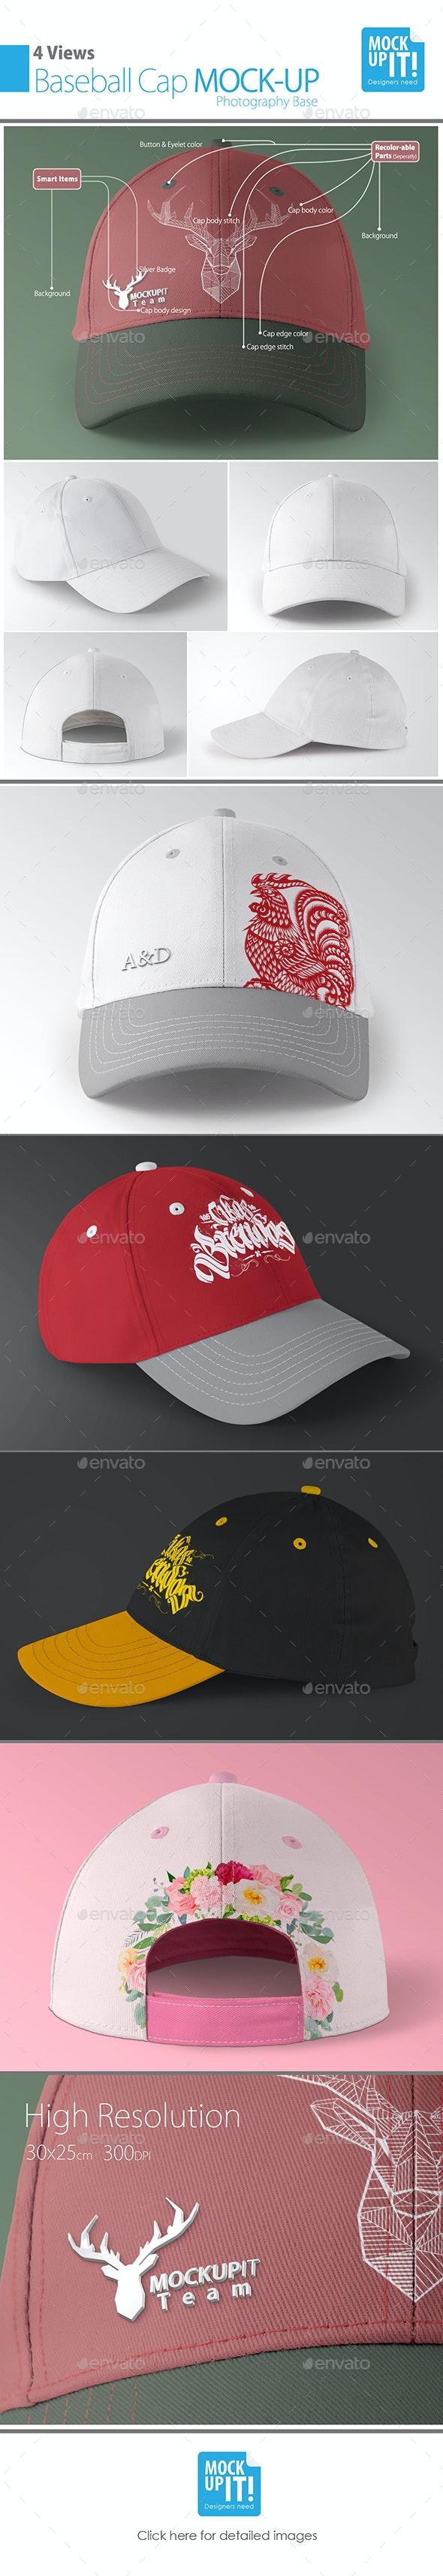 Baseball Cap Mockup - Apparel Product Mock-Ups